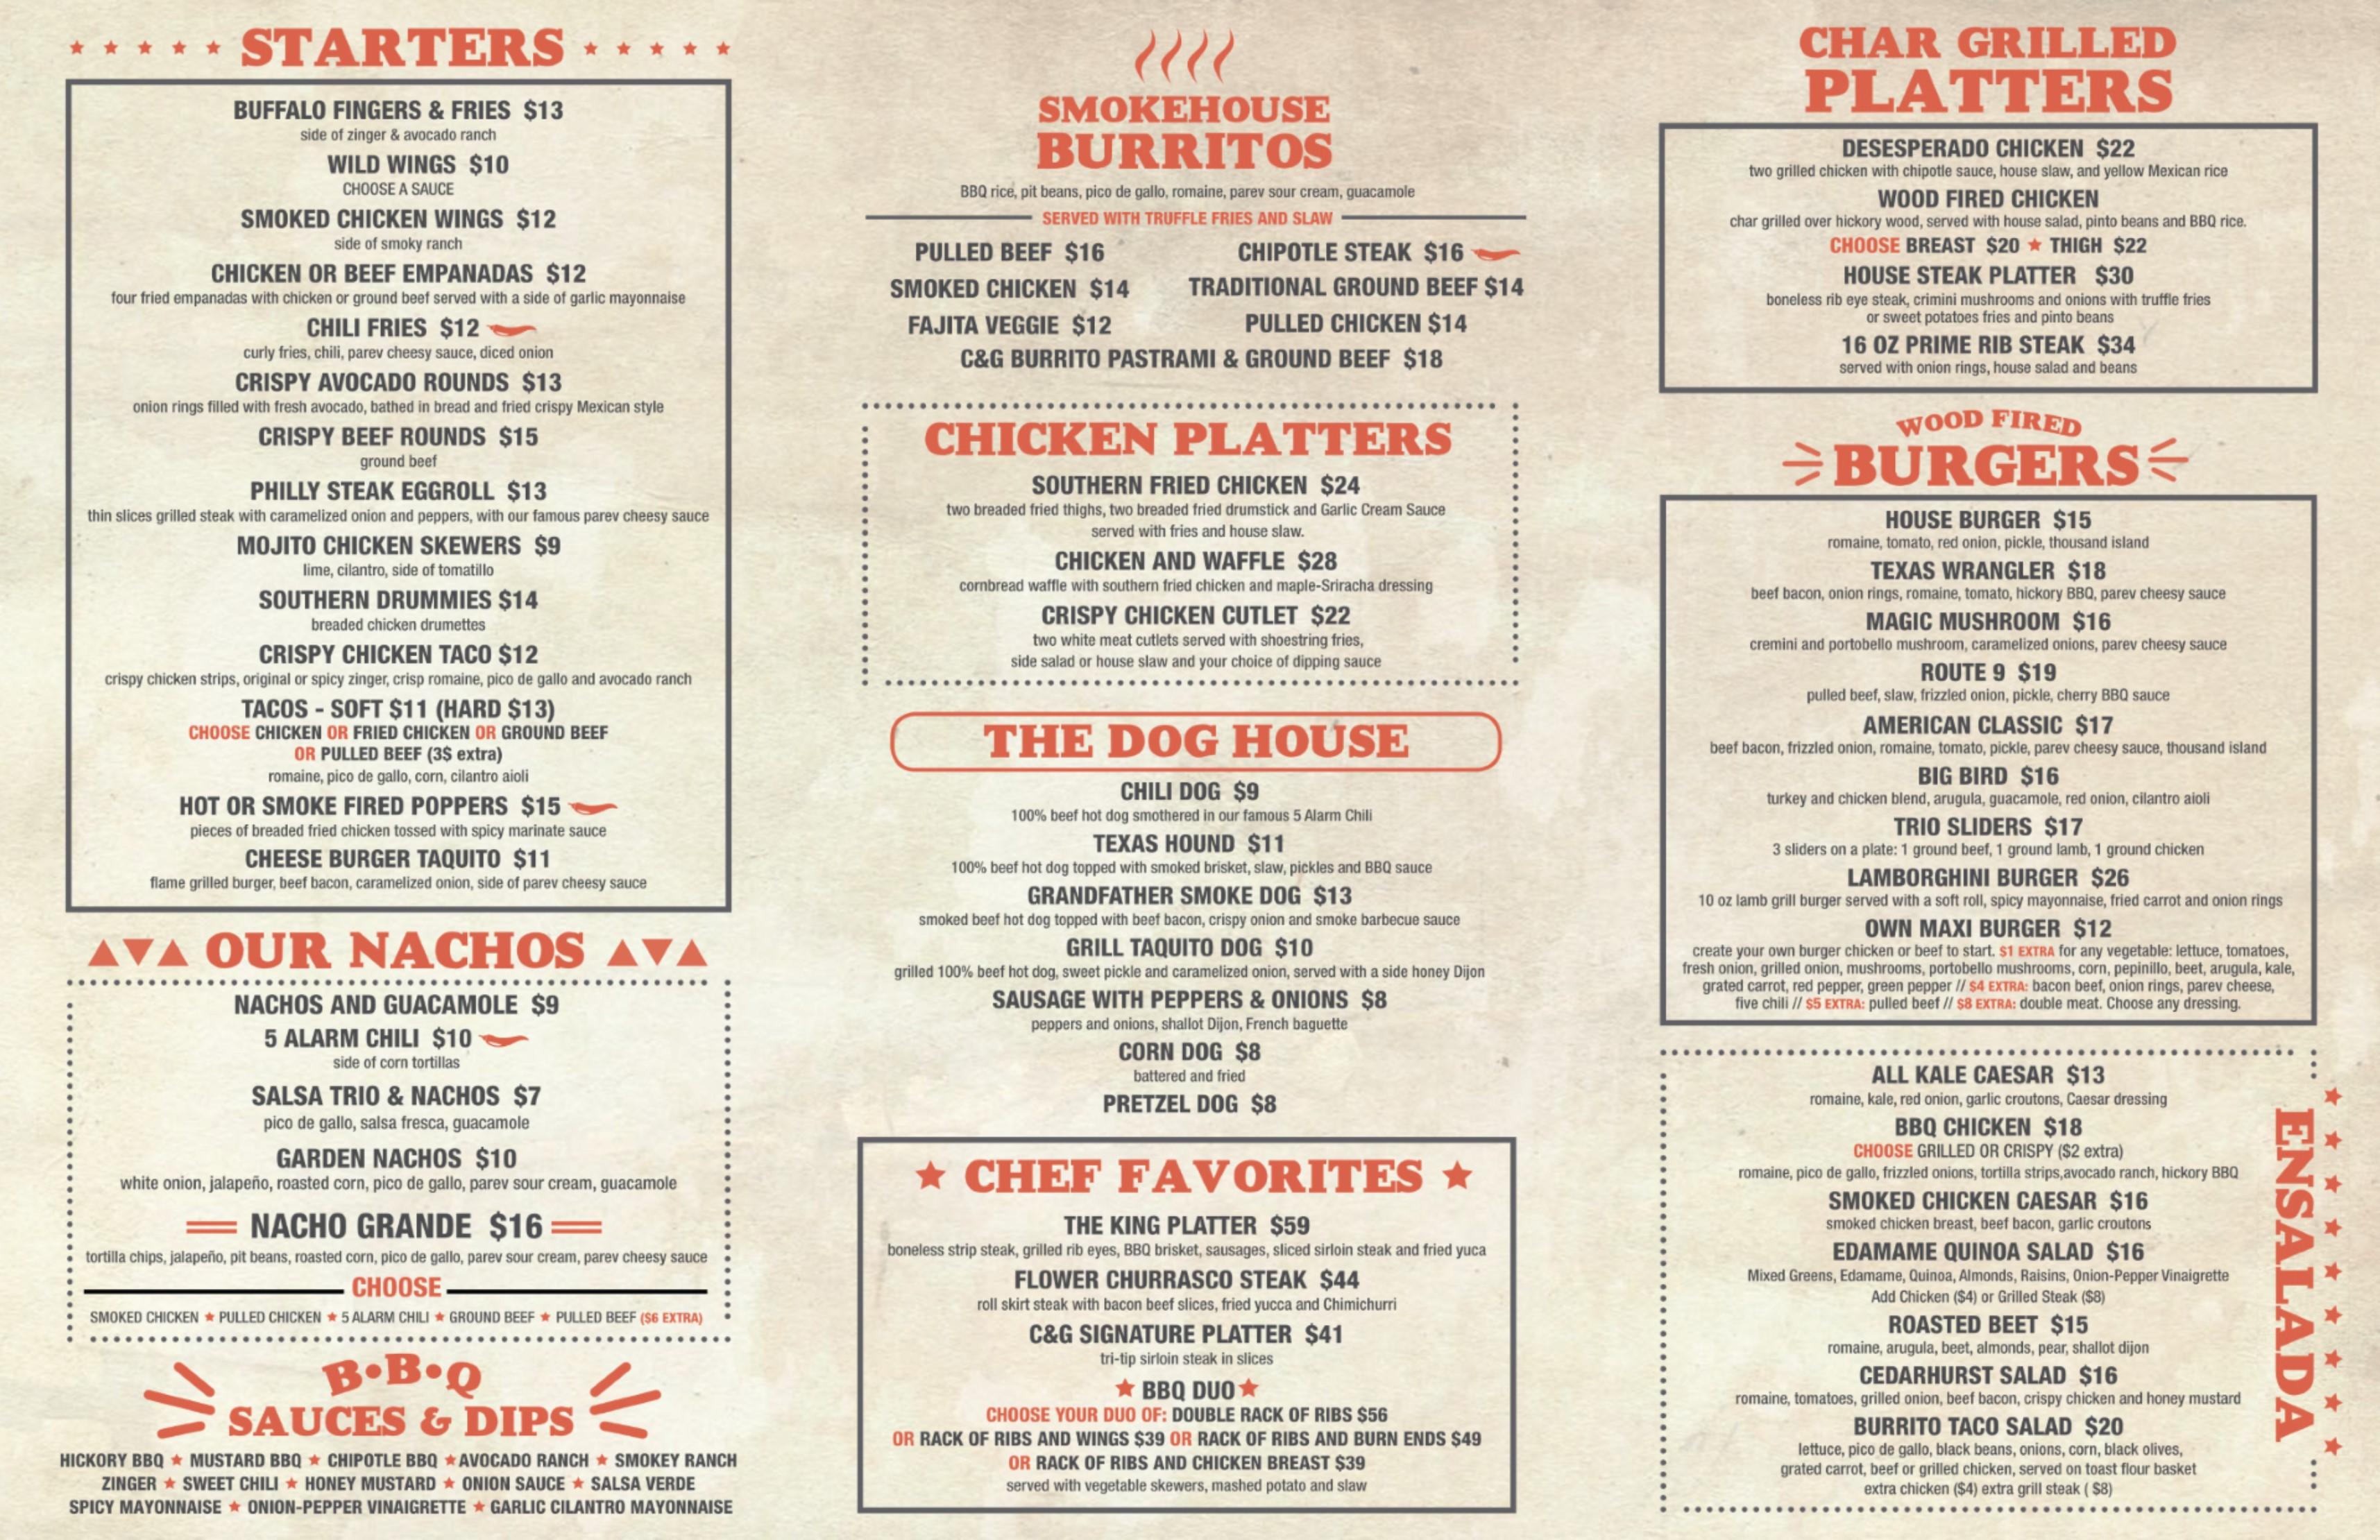 menu sides (1 of 2)